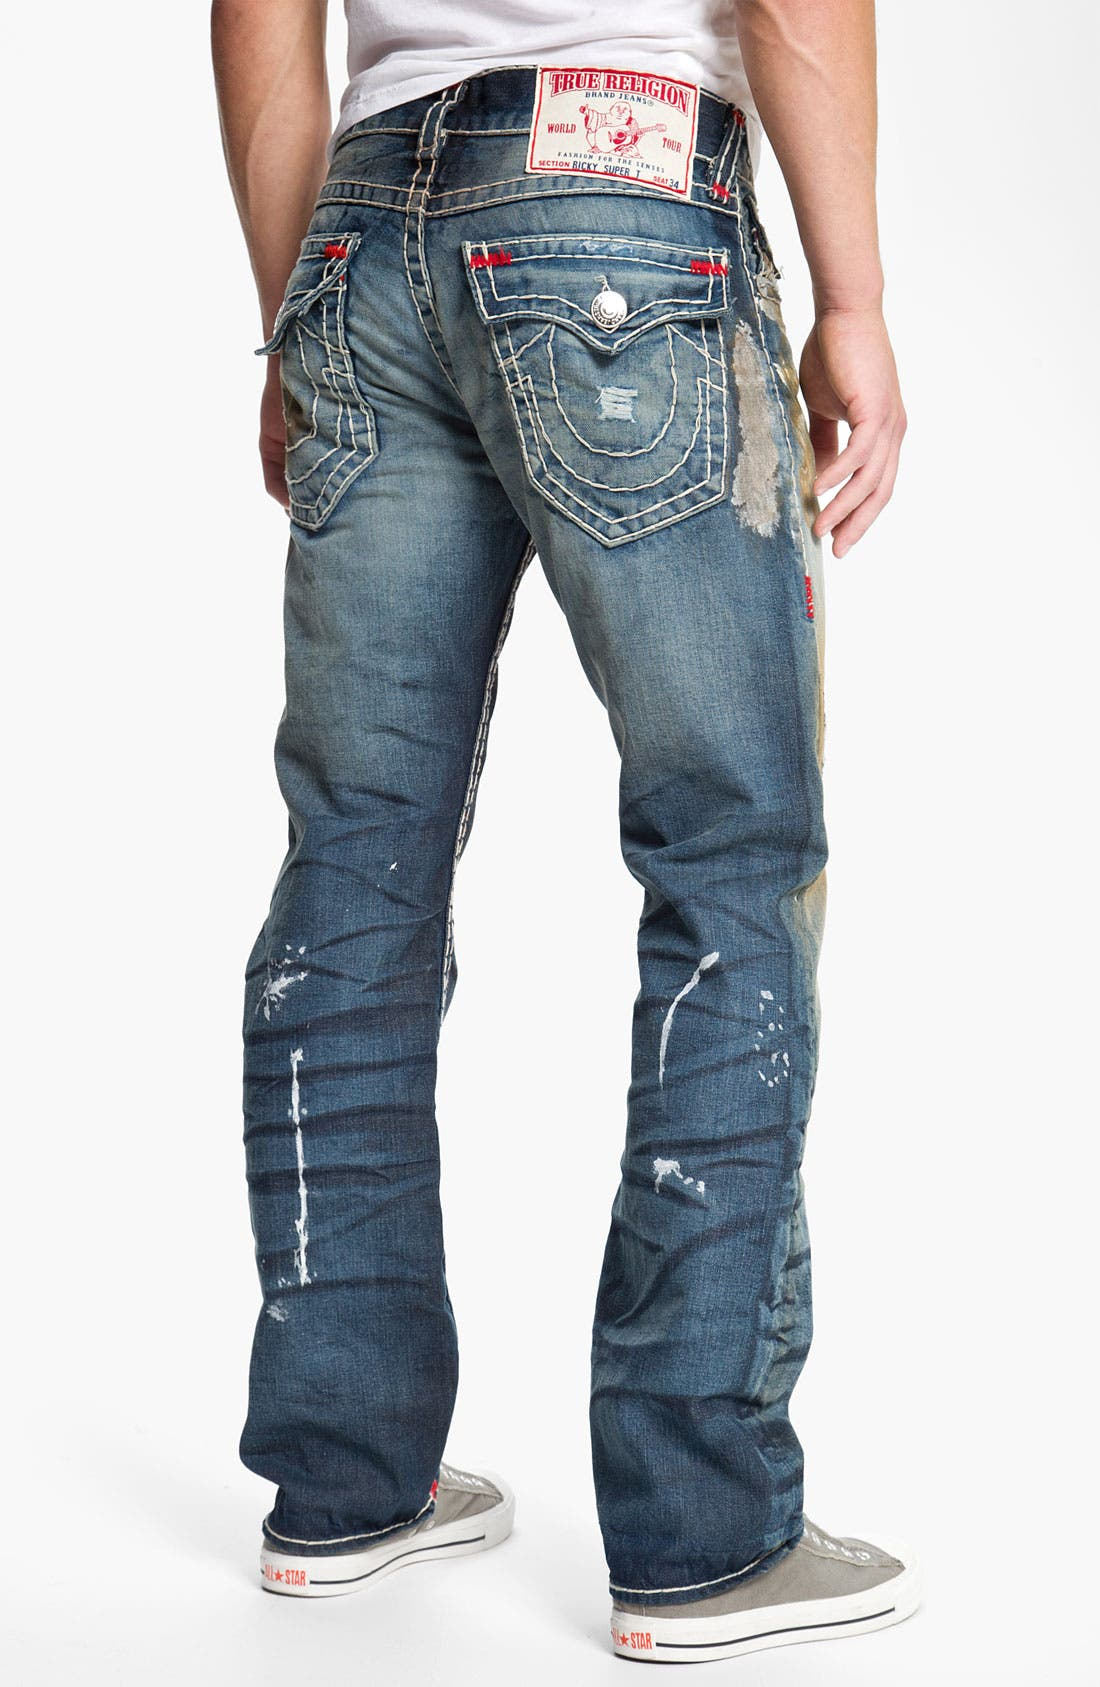 Alternate Image 1 Selected - True Religion Brand Jeans 'Ricky' Straight Leg Jeans (Bounty)